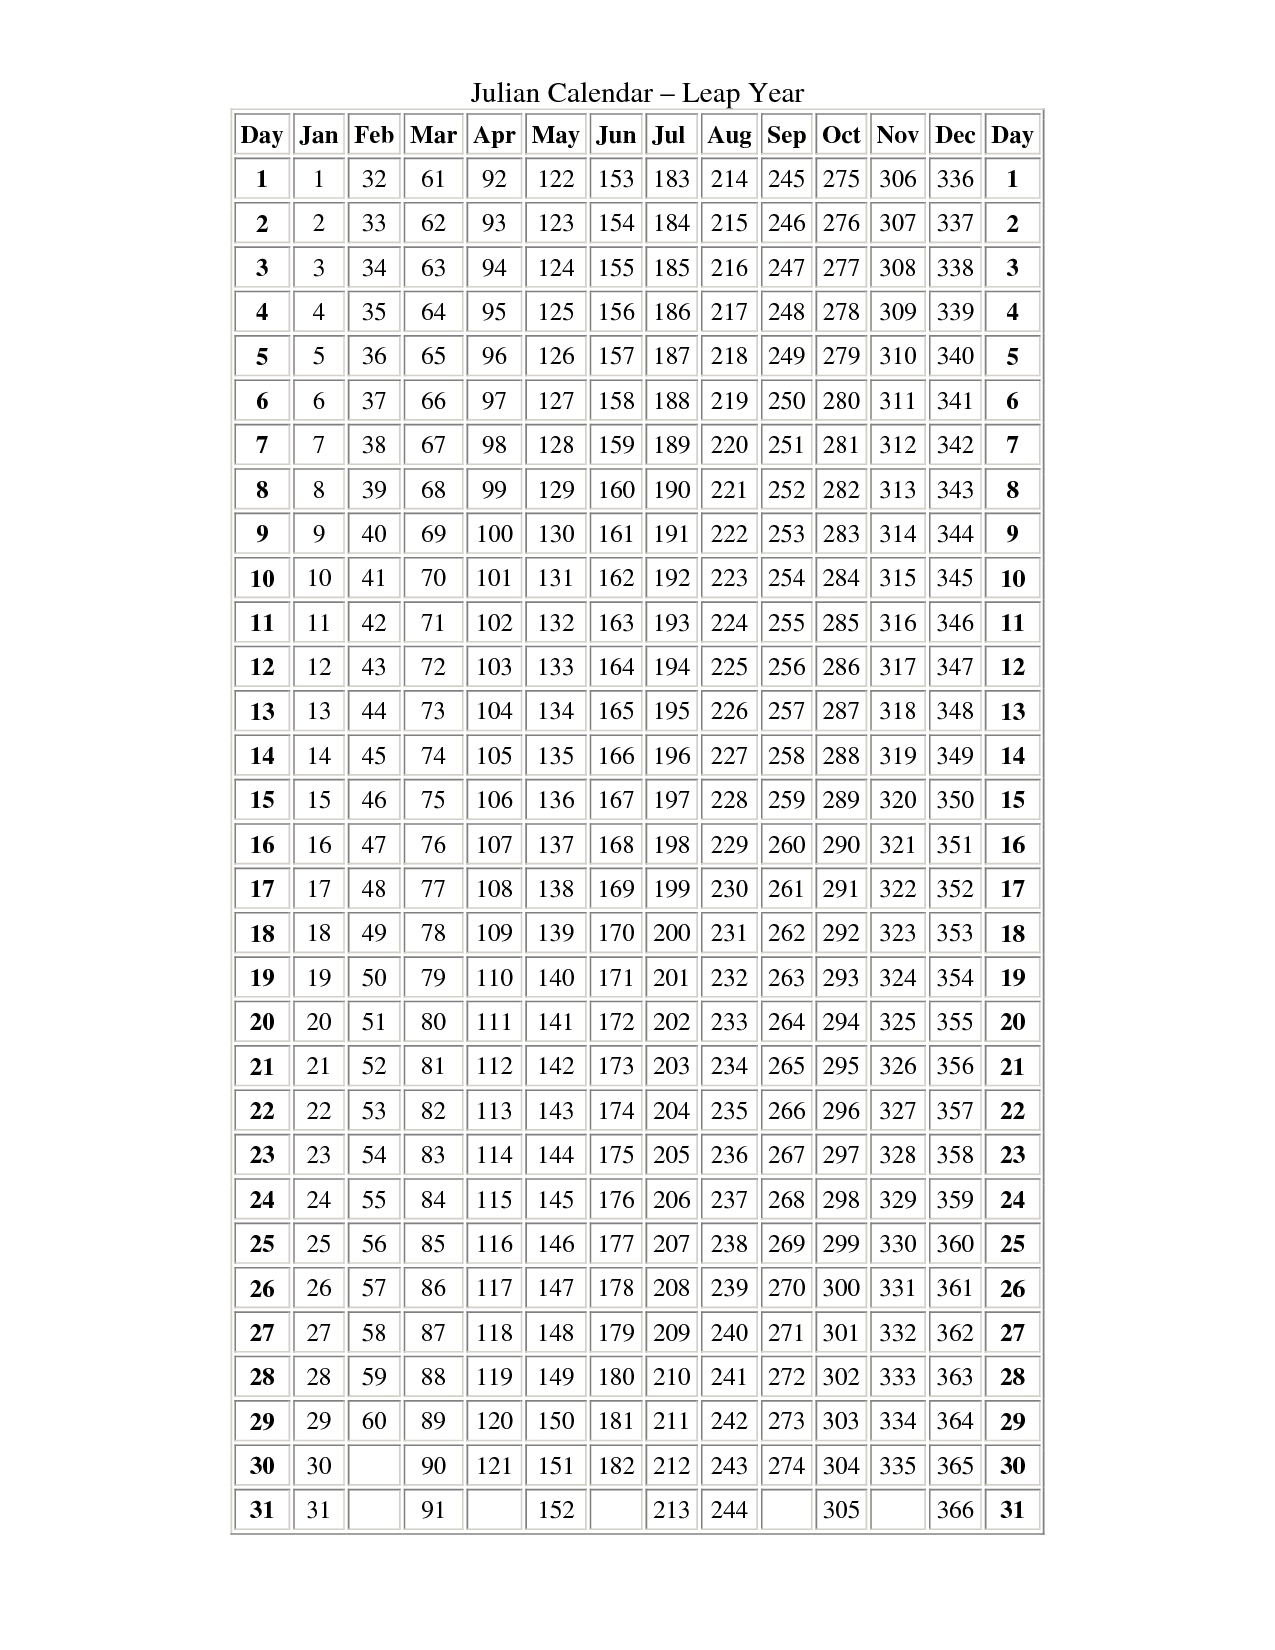 Printable Julian Date Calendar | Calendar For Planning with regard to Julian Date Calender For Leap Years Printable